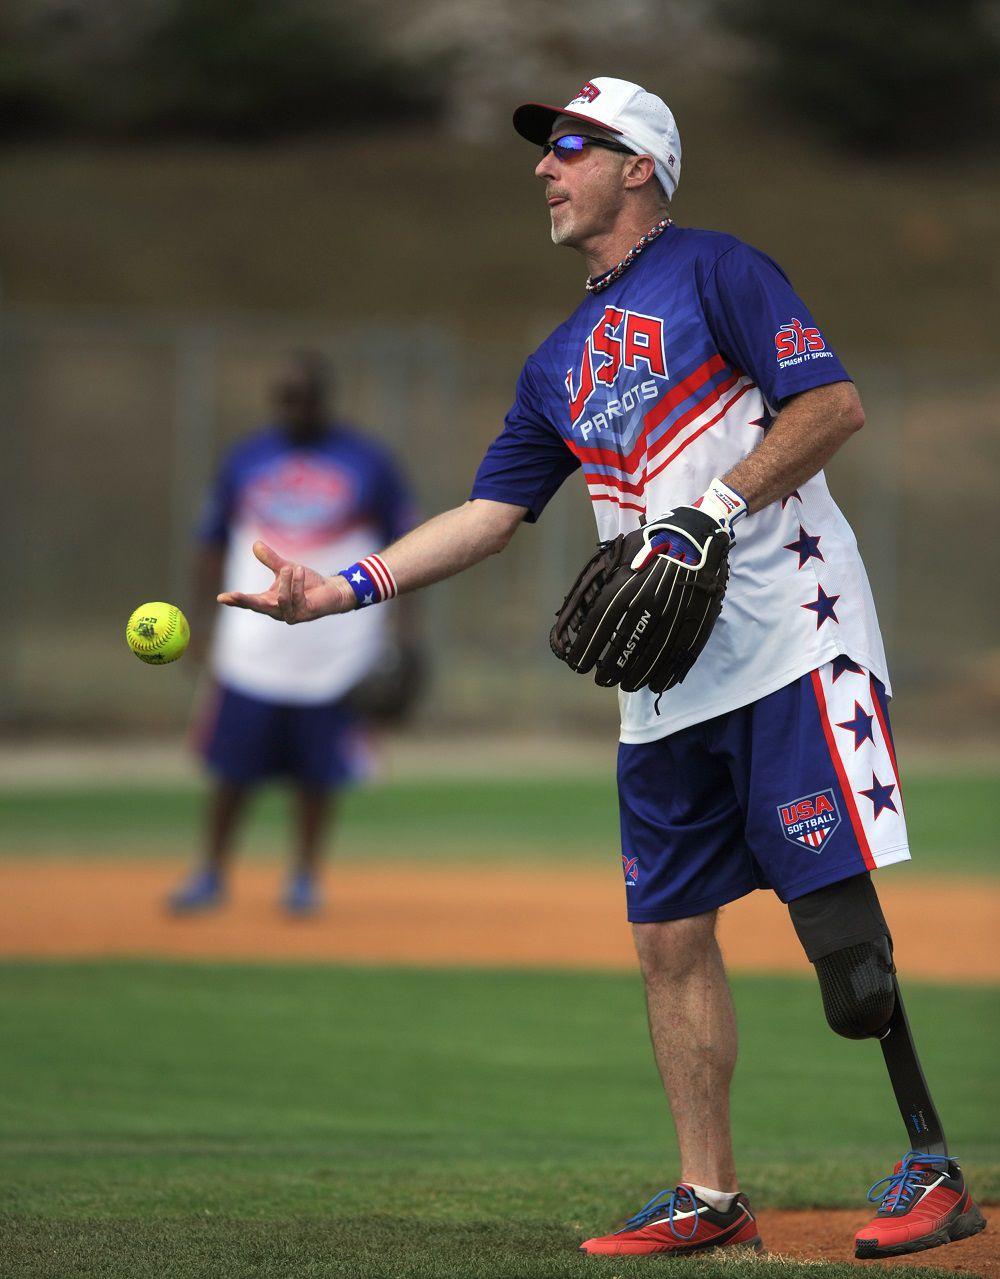 Amputee softball 2 pitcher.jpg